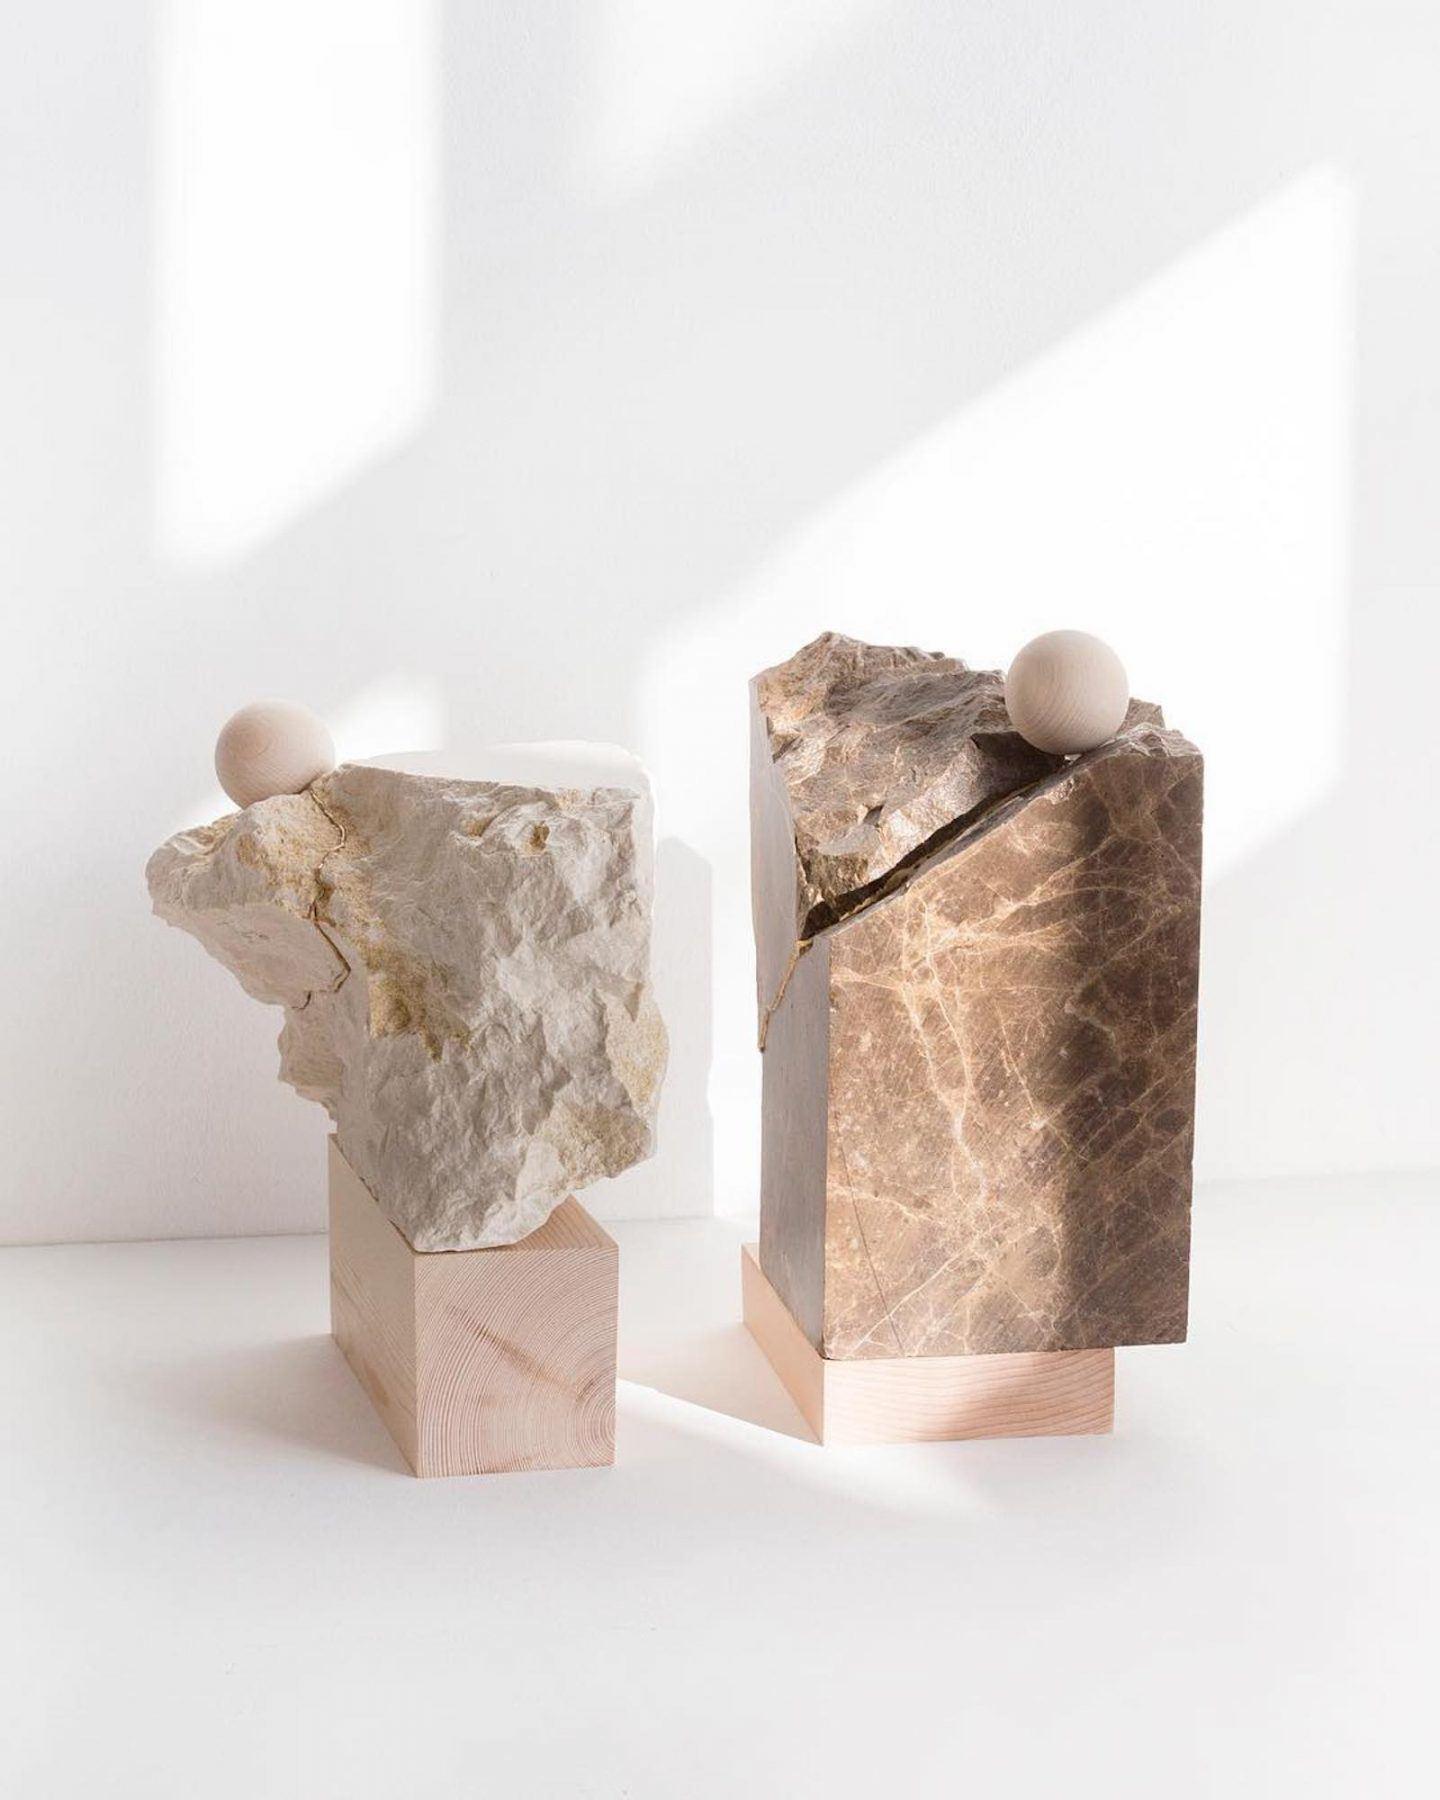 IGNANT-Design-Carla-Cascales-Alimbau-006